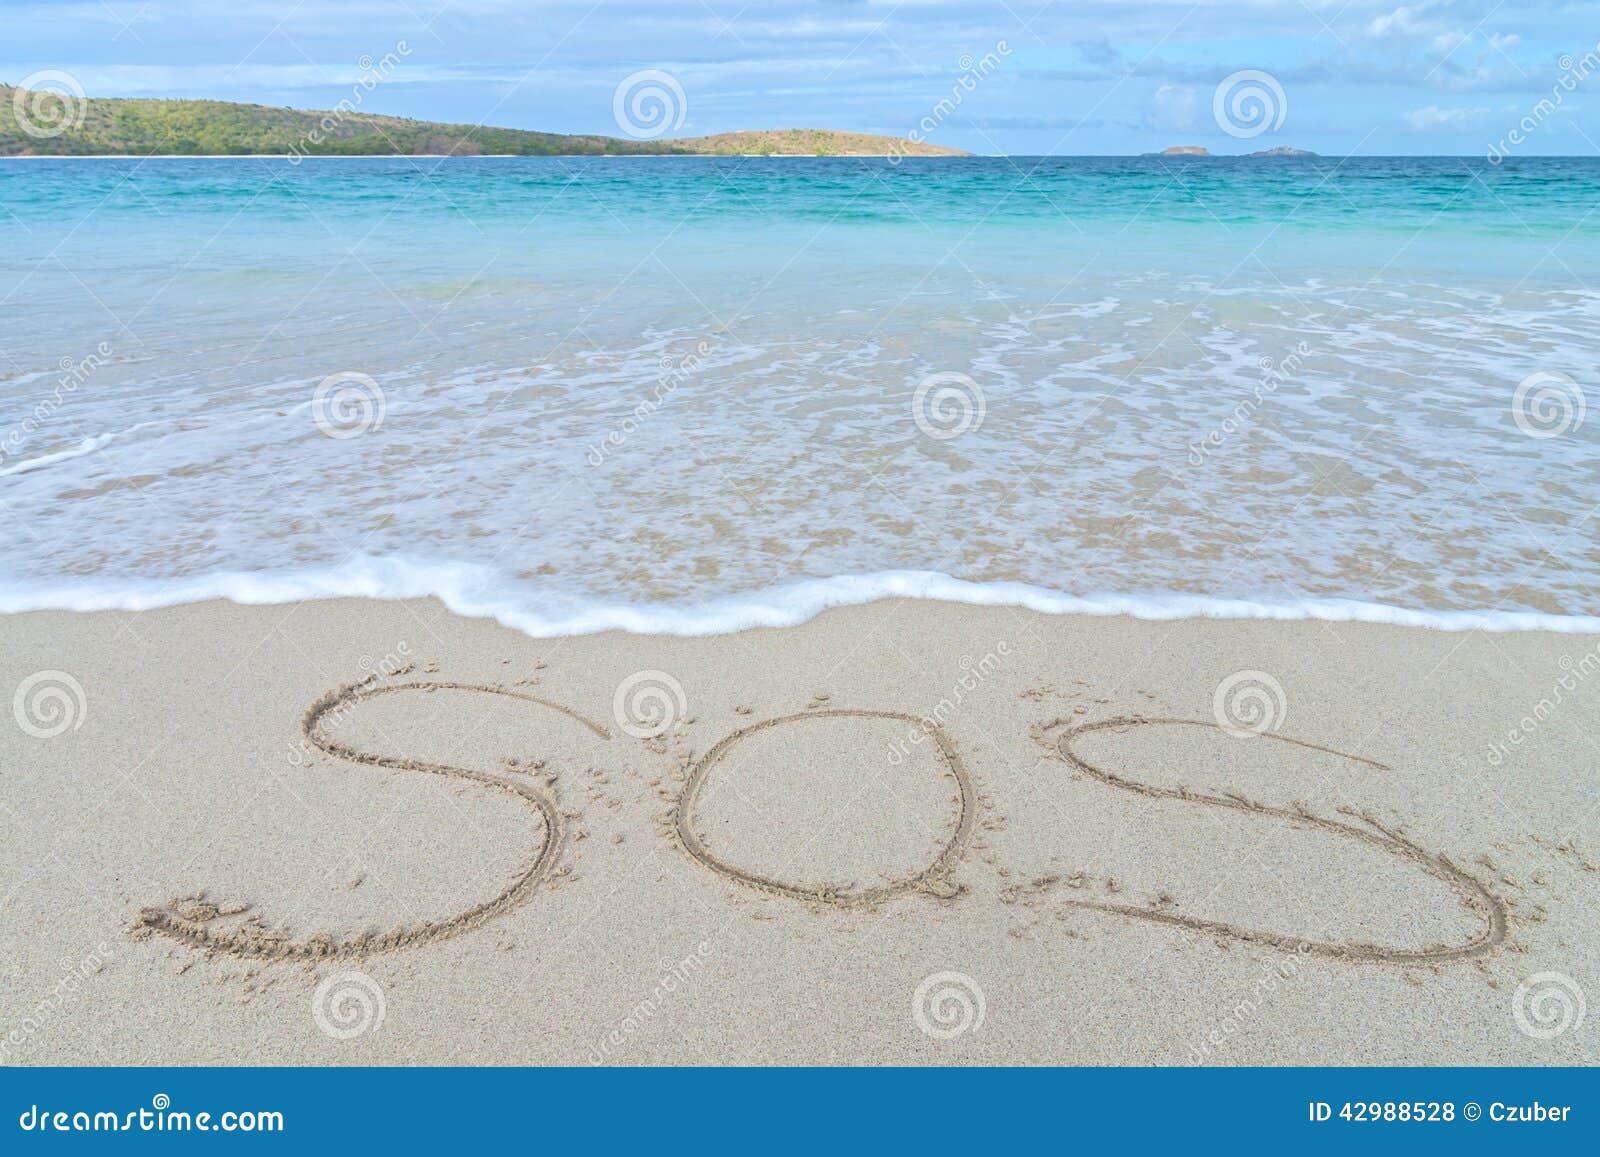 SOS distress sign